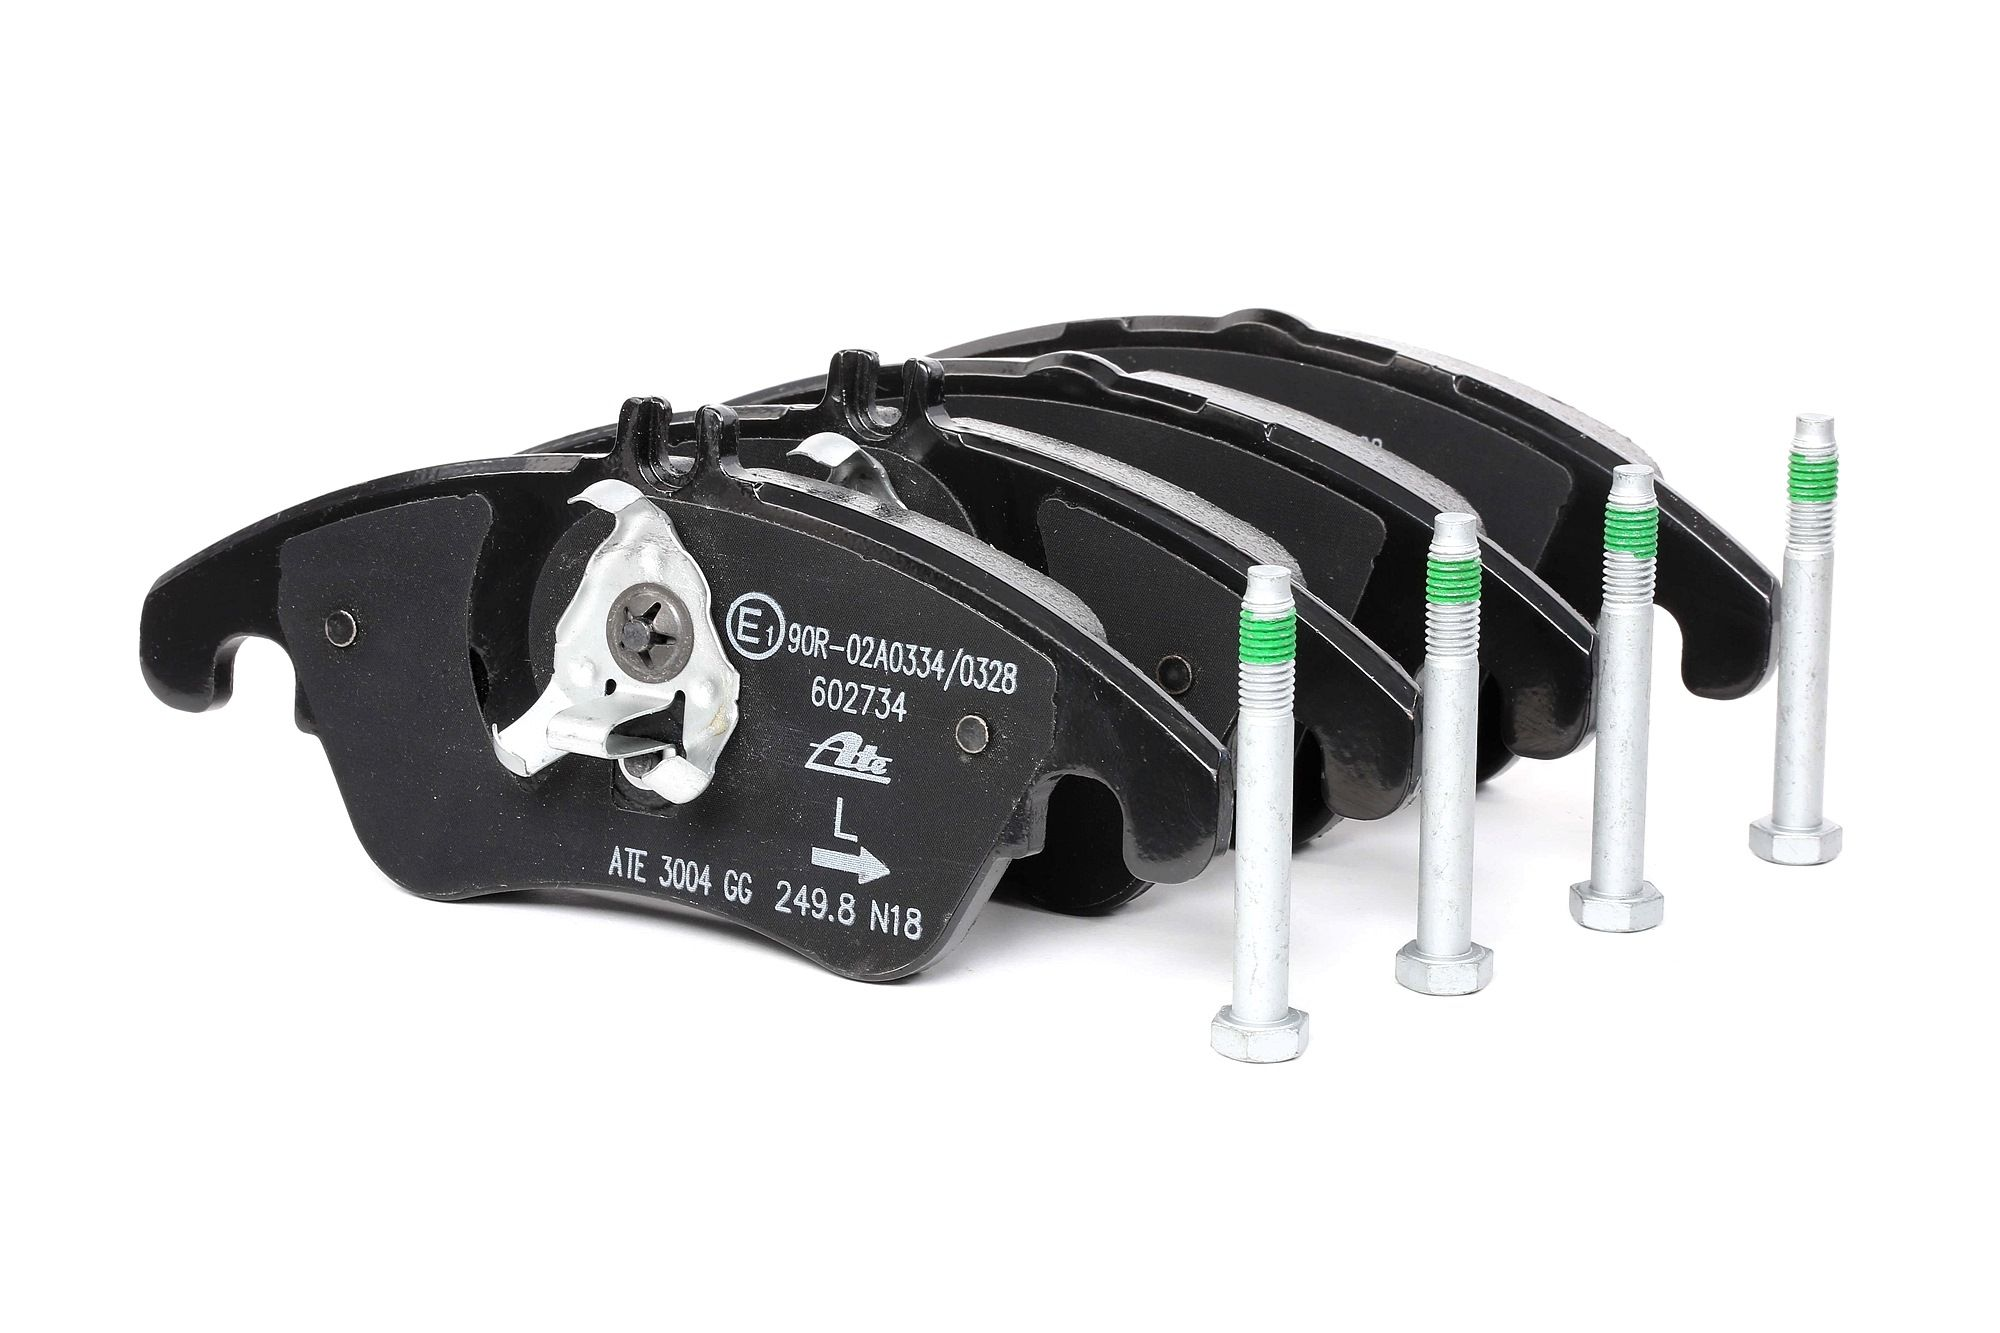 MERCEDES-BENZ C-Klasse 2020 Bremsbelagsatz - Original ATE 13.0470-2734.2 Höhe: 80,8mm, Breite: 188,0mm, Dicke/Stärke: 19,0mm